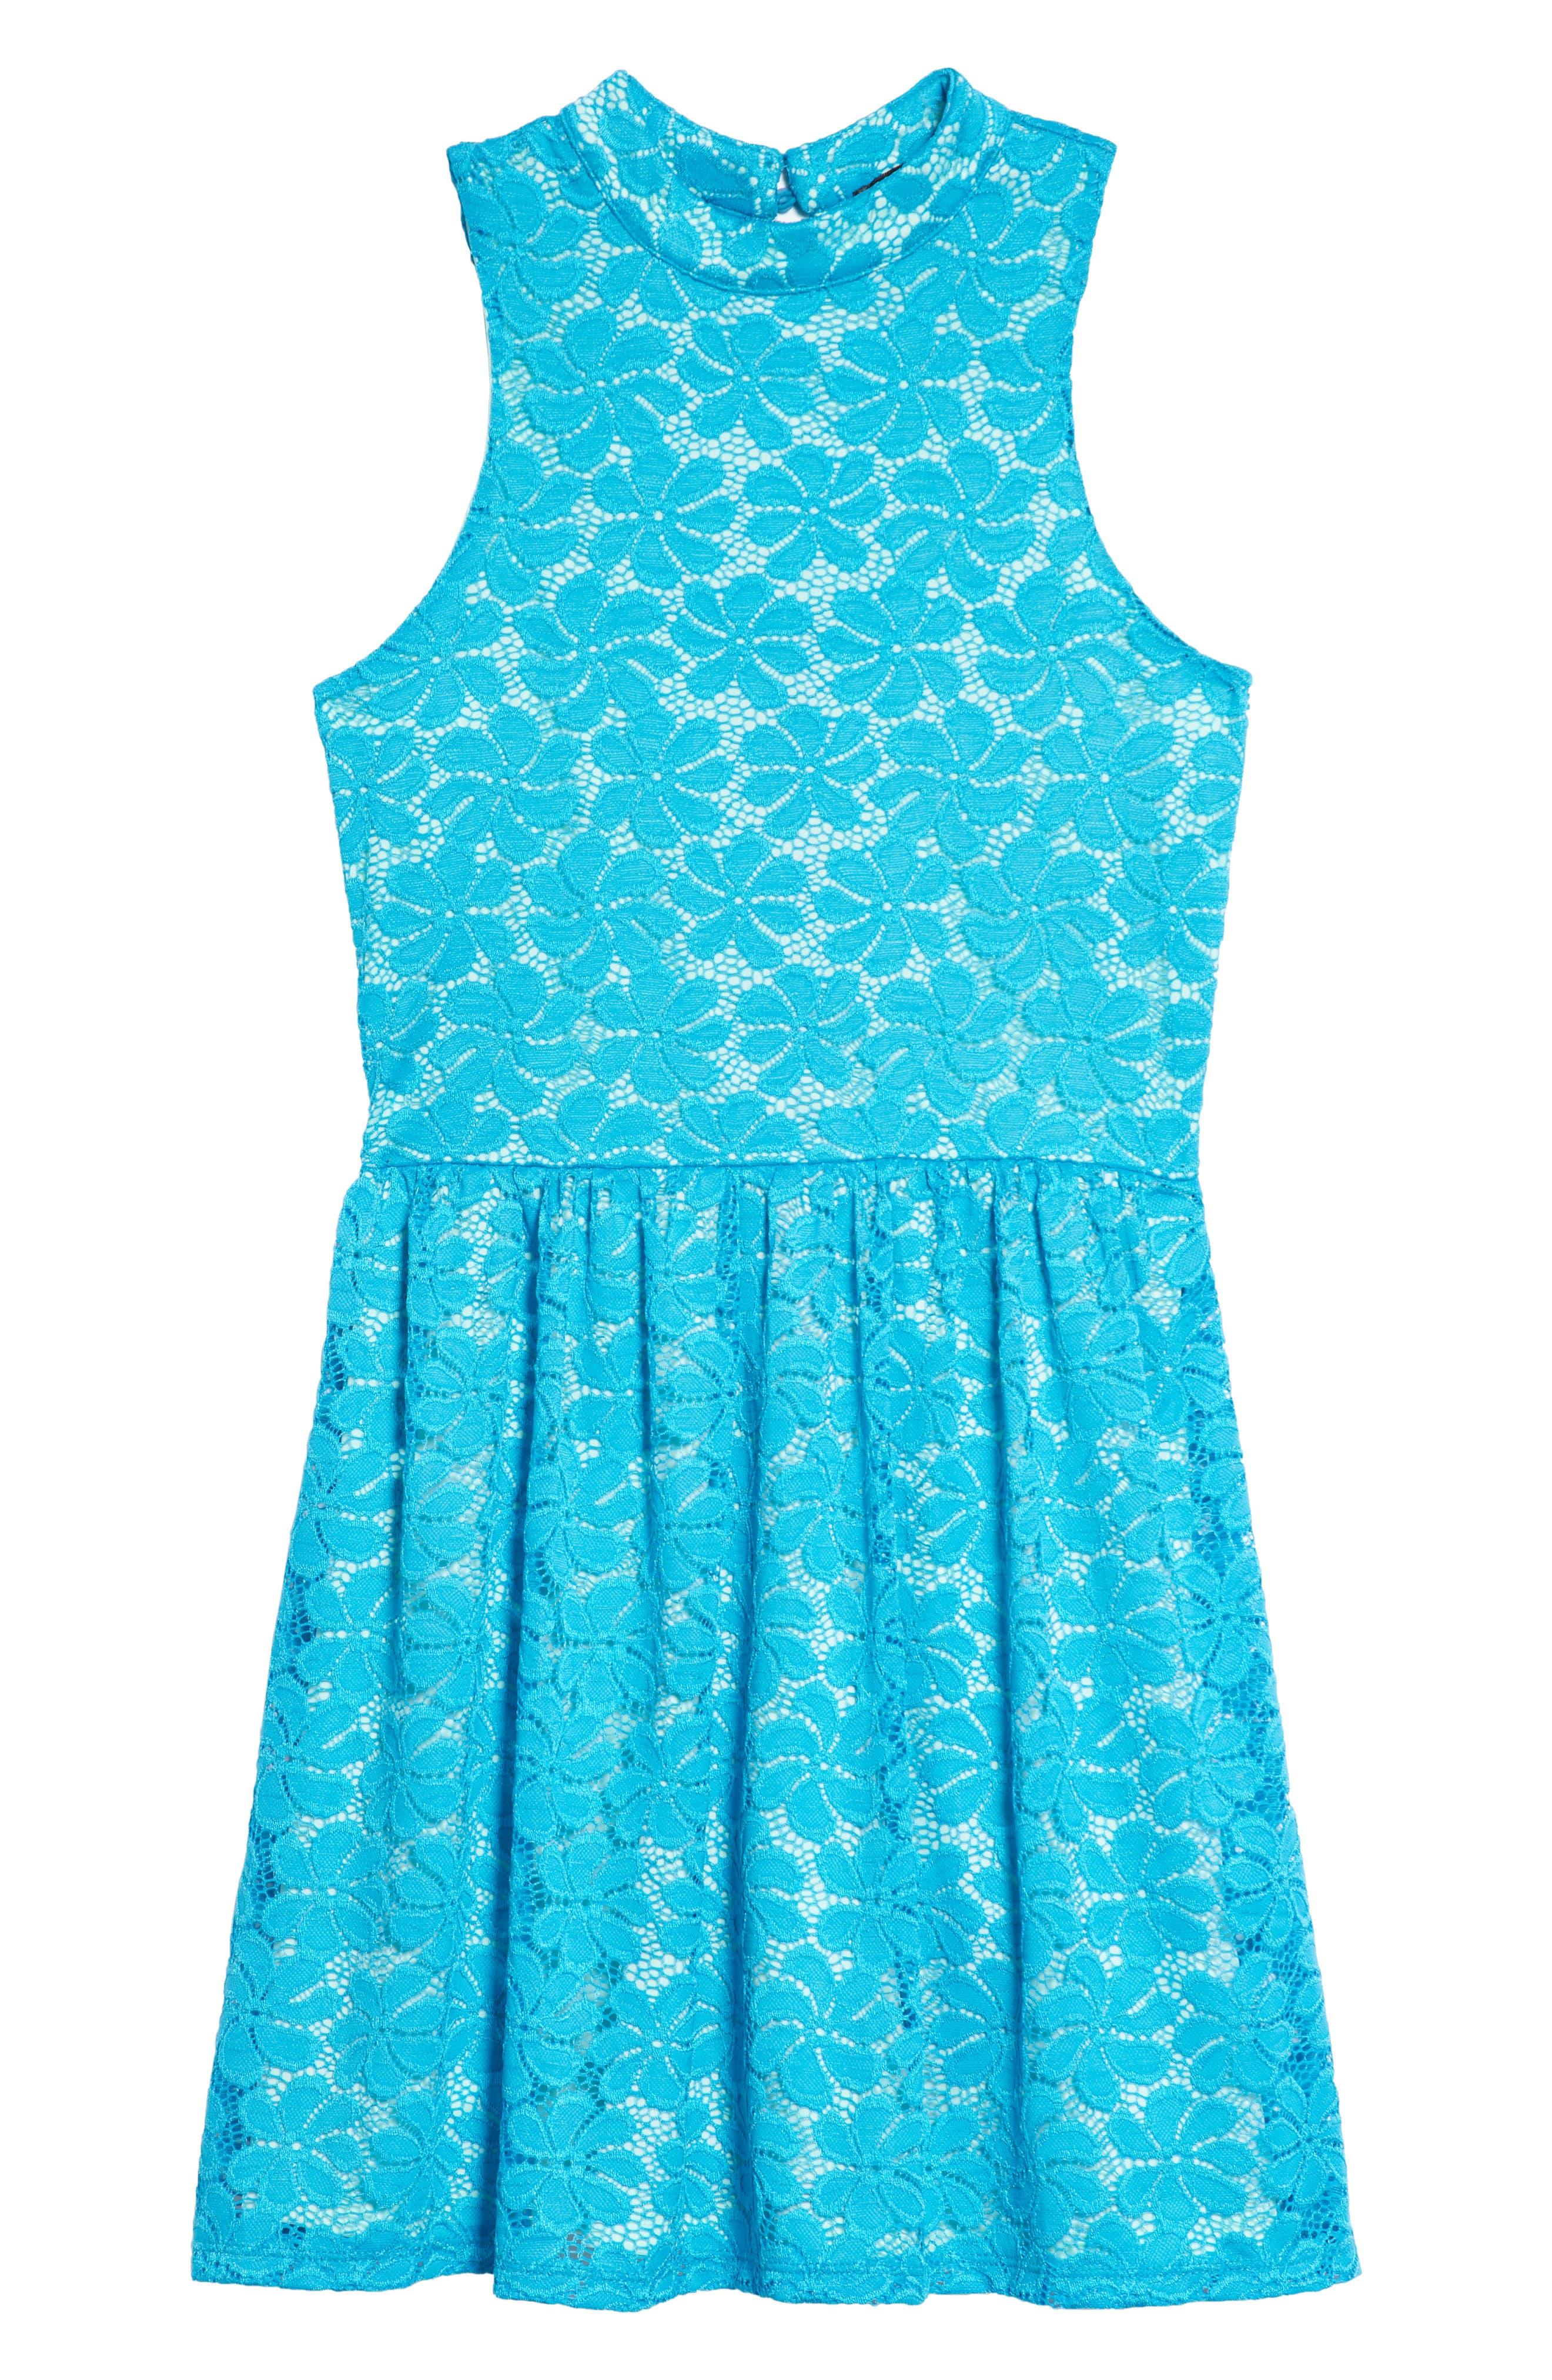 Hailee Lace Dress,                         Main,                         color, 400